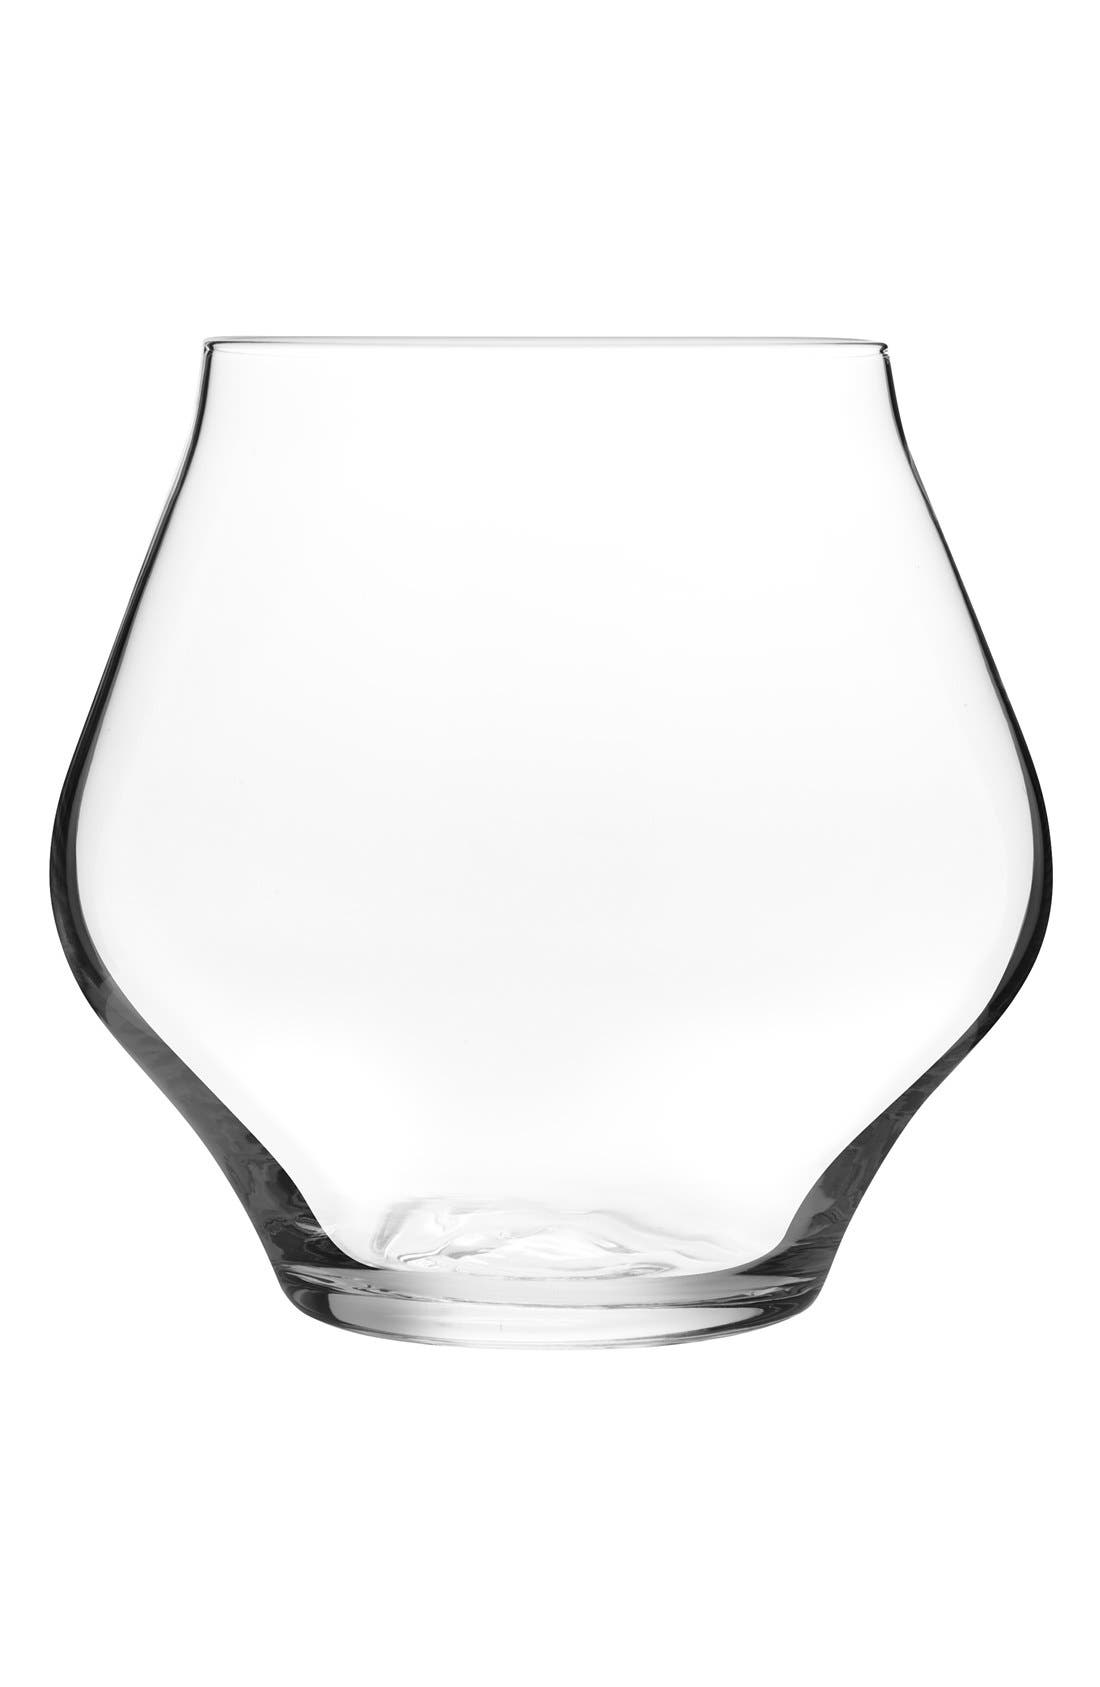 Set of 2 Stemless Wine Glasses,                         Main,                         color, 100